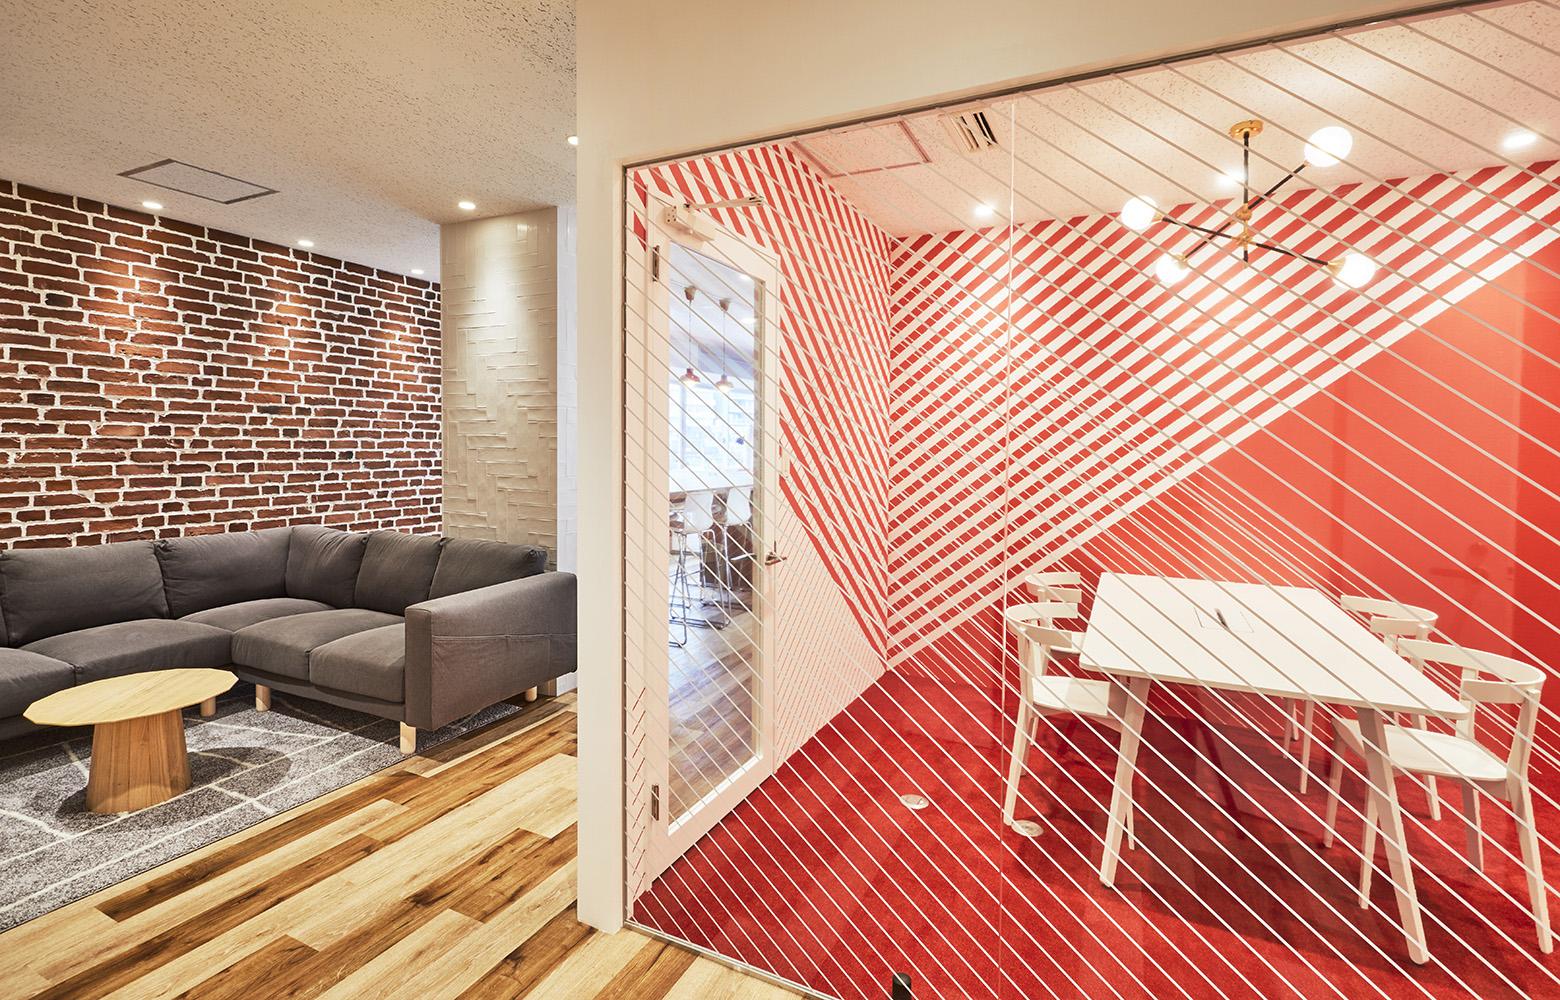 Sopexa Japon 株式会社 Waiting Space & Meeting Room デザイン・レイアウト事例